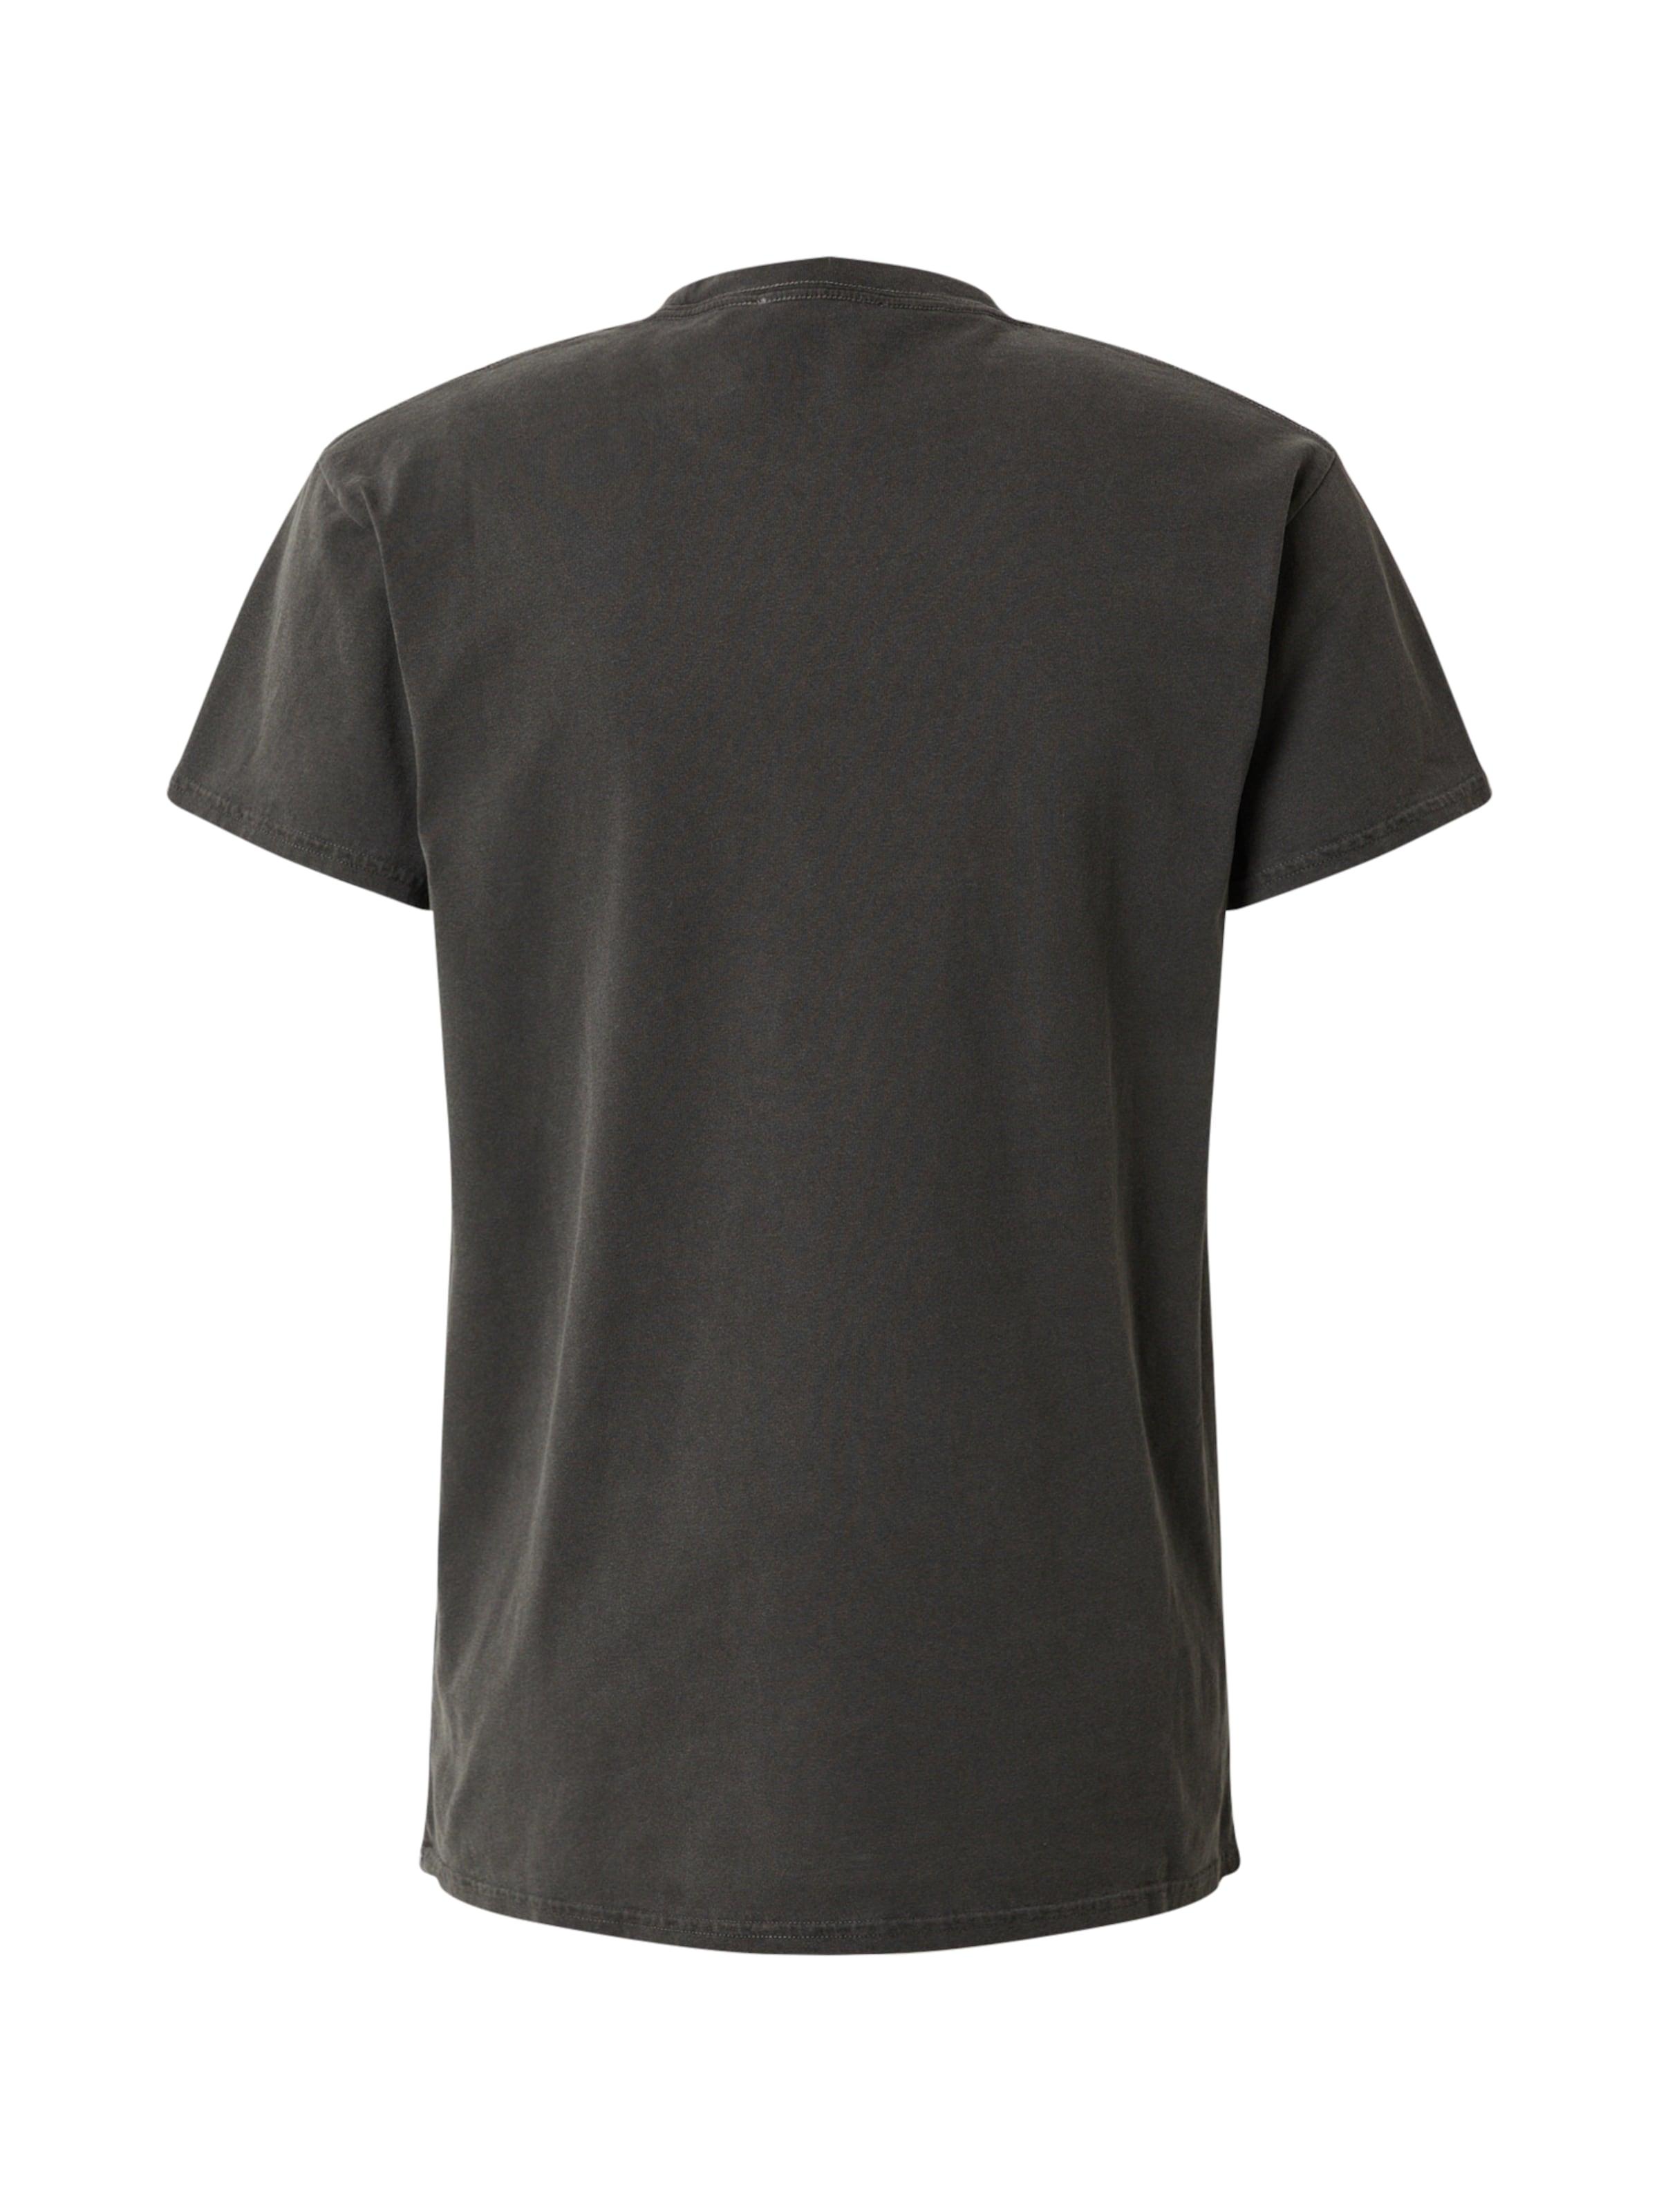 ABOUT YOU x Magic Fox T-Shirt Luke en anthracite 2LevGS